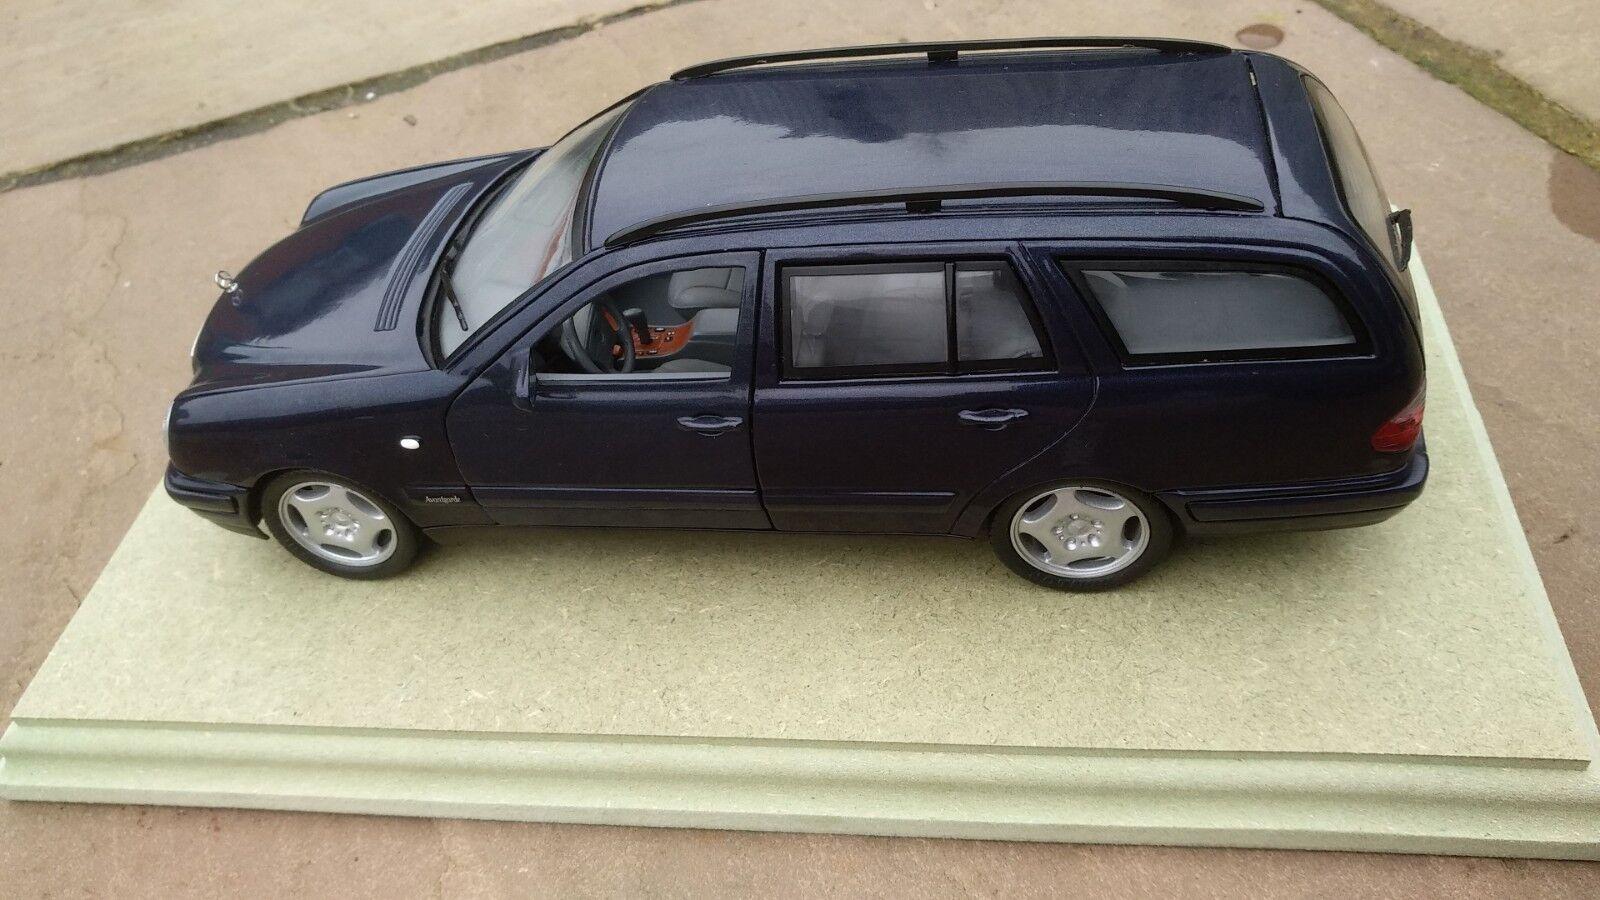 ANSON 1 18 30328 MERCEDES MERCEDES MERCEDES BENZ W 210 T E 420 CLASS ESTATE blueE PLINTH TOY CAR 9bbcf7